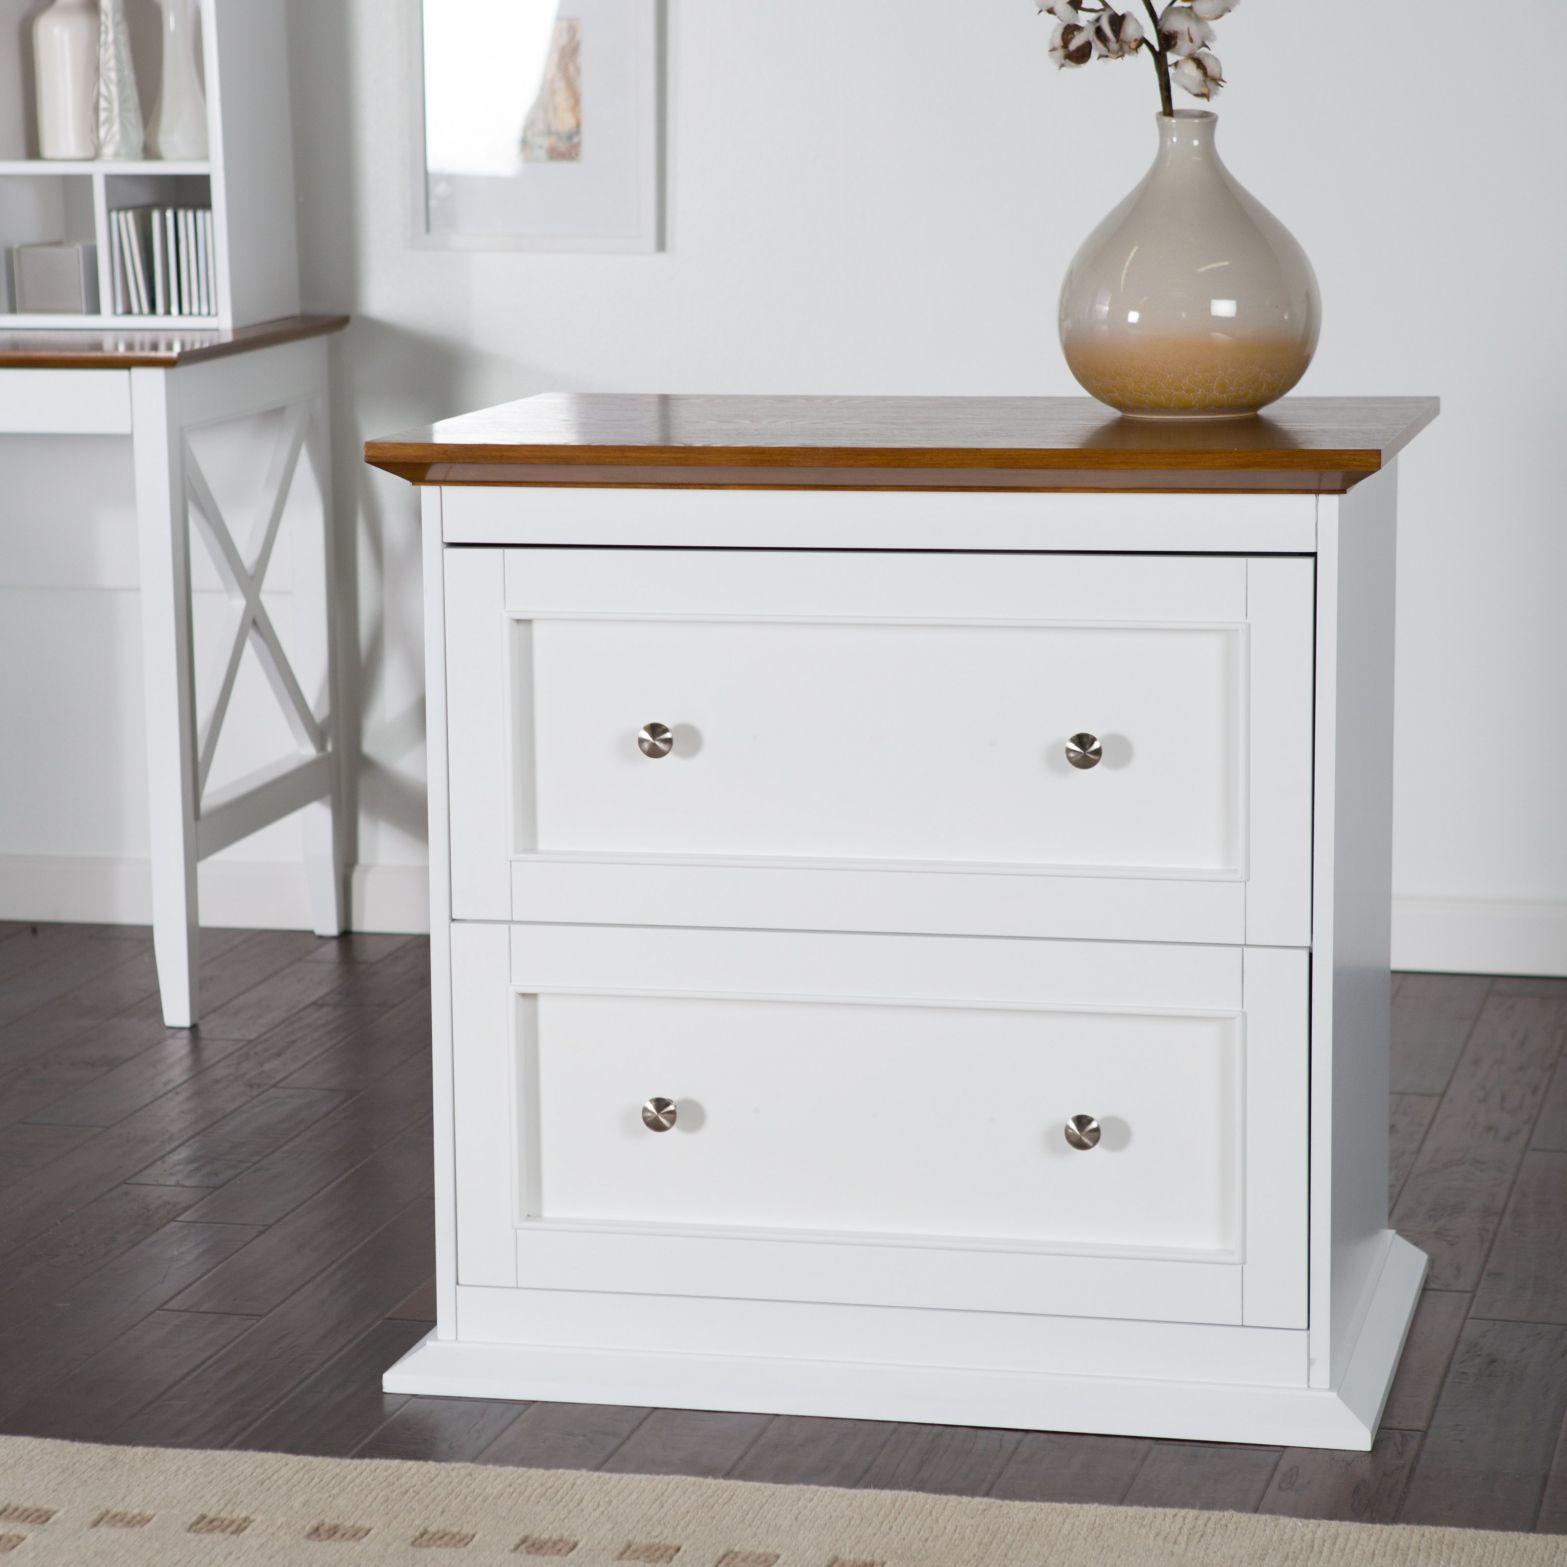 55 Home fice File Cabinet Used Home fice Furniture Check more